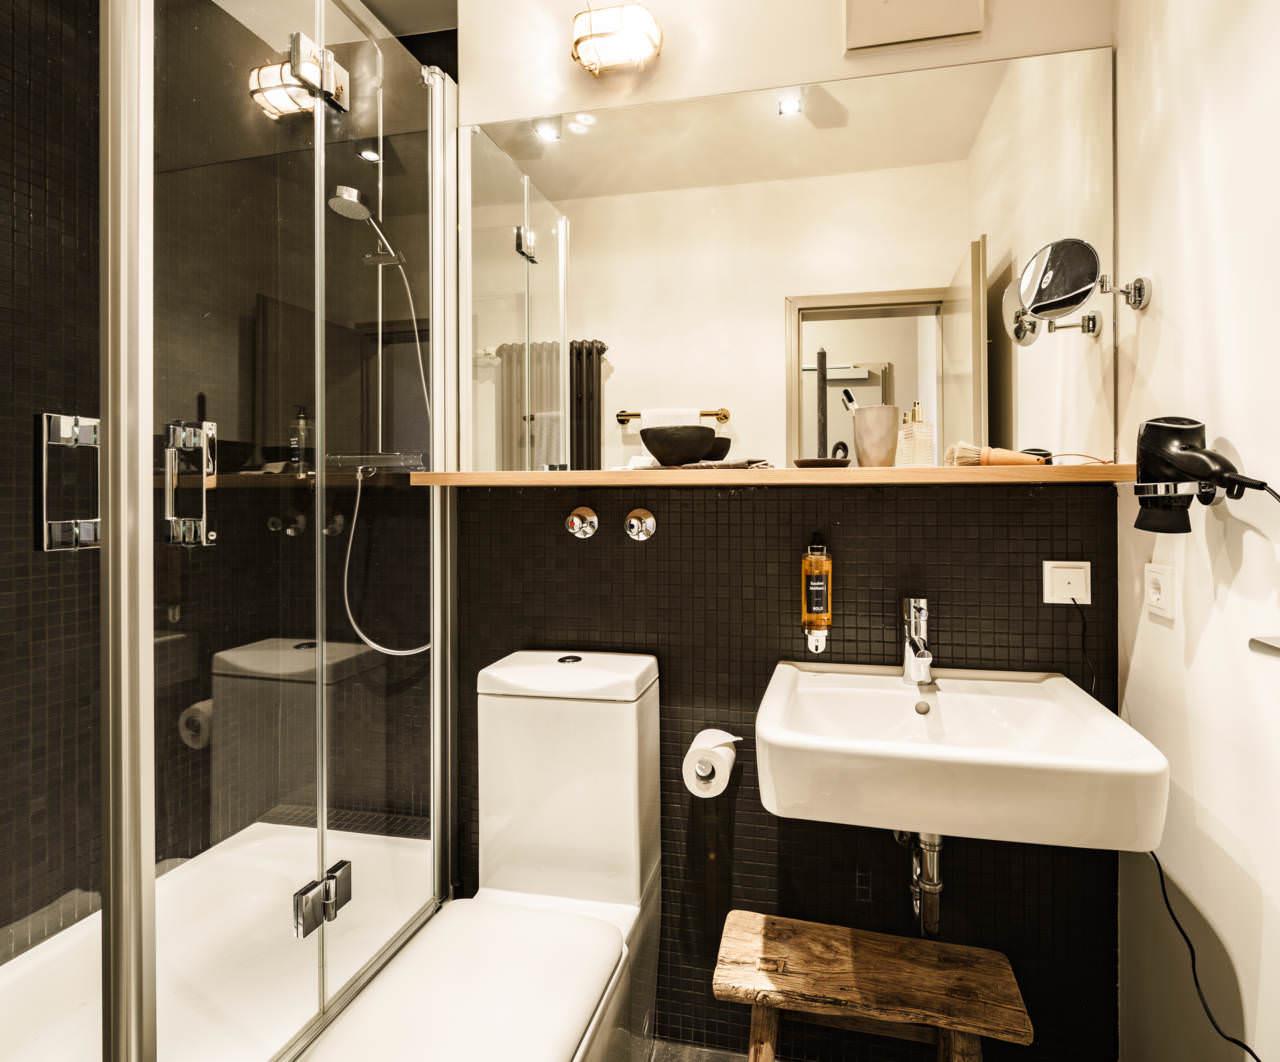 BOLD Apartments Munich Zentrum Student Rooms • Student.com